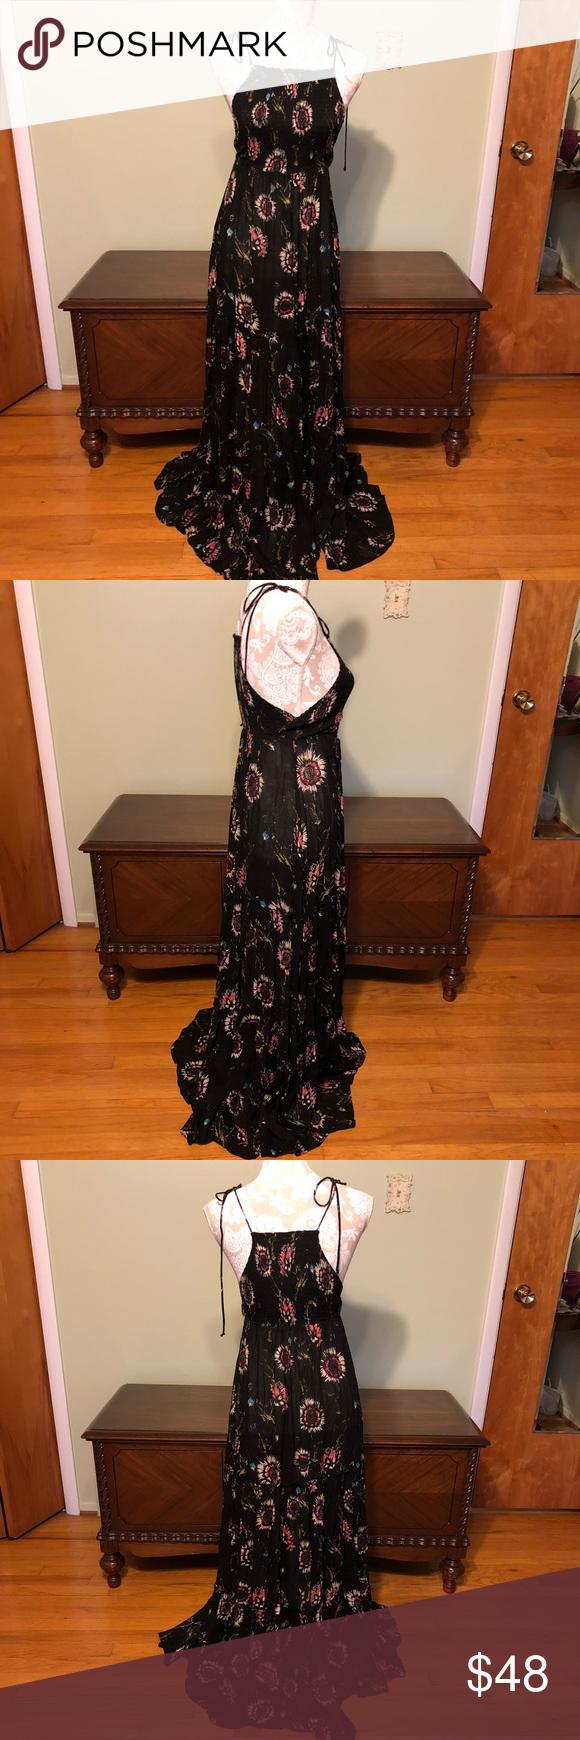 Free People Sunflower Smocked Maxi Dress Smocked Maxi Dresses Free People Maxi Dress Maxi Dress [ 1740 x 580 Pixel ]